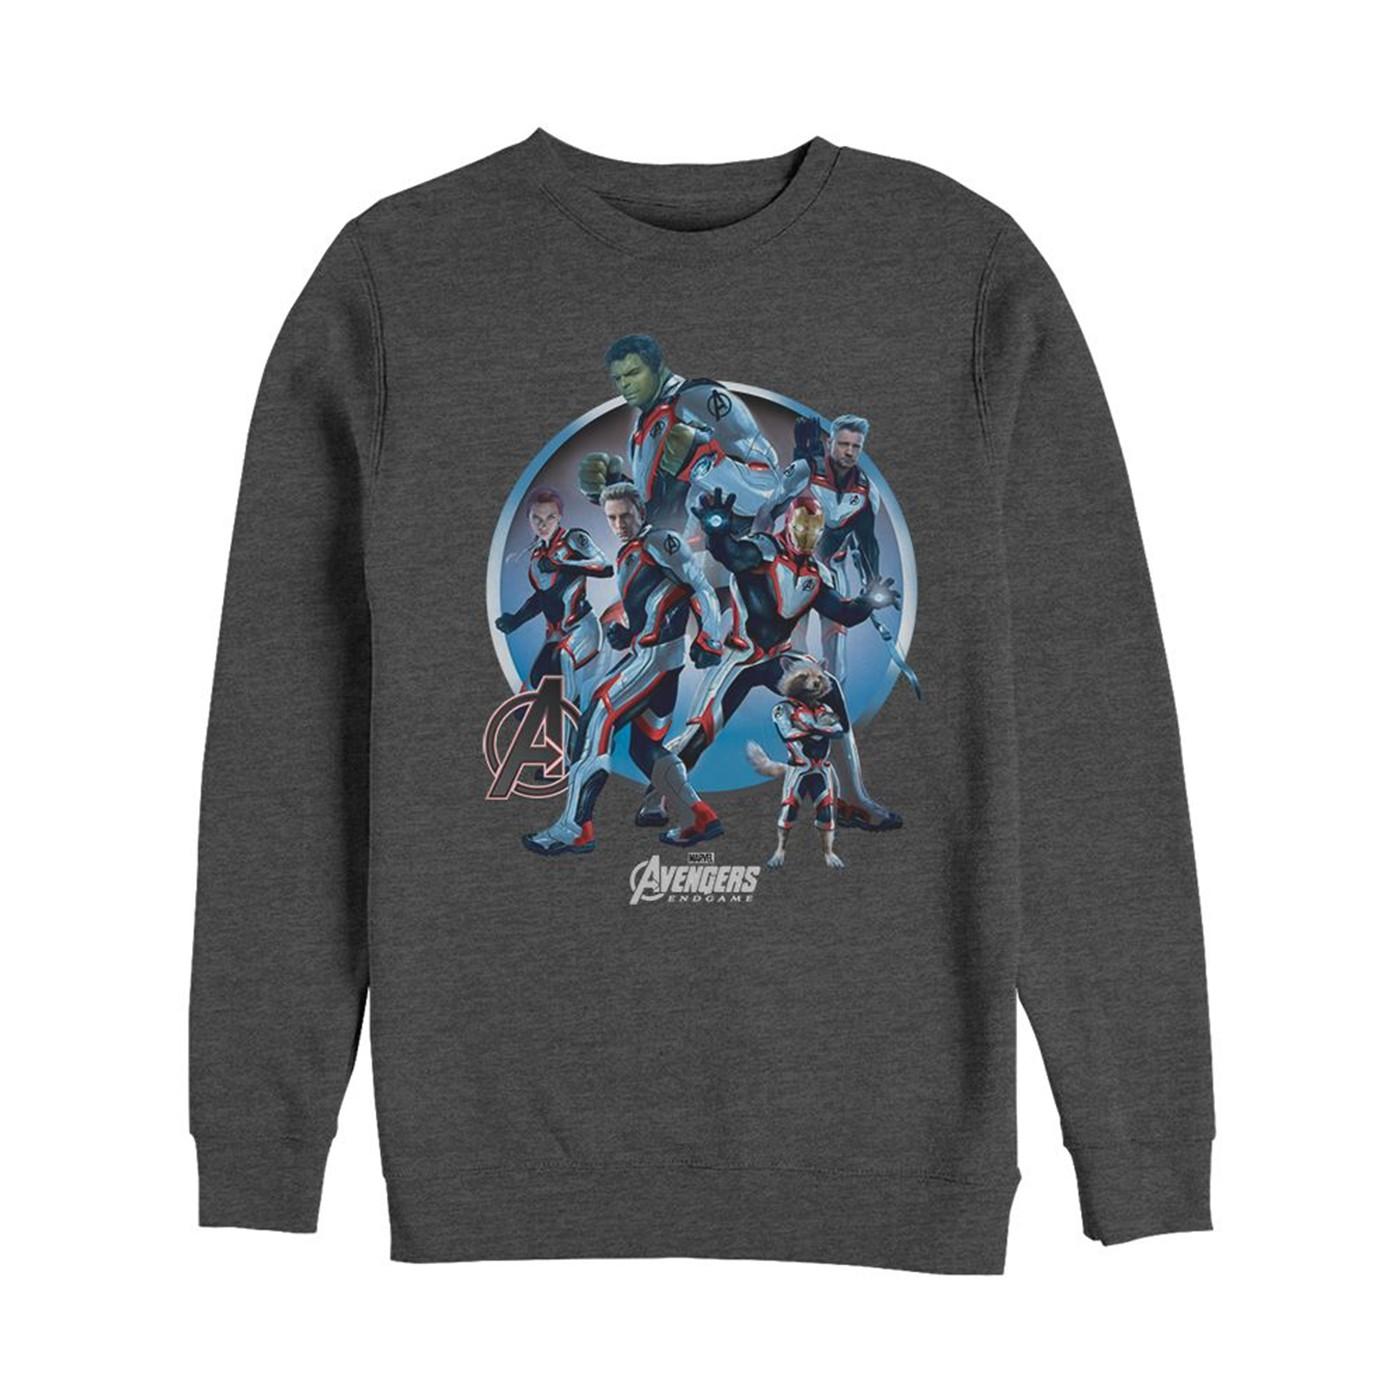 Avengers Endgame Unite Crewneck Sweater